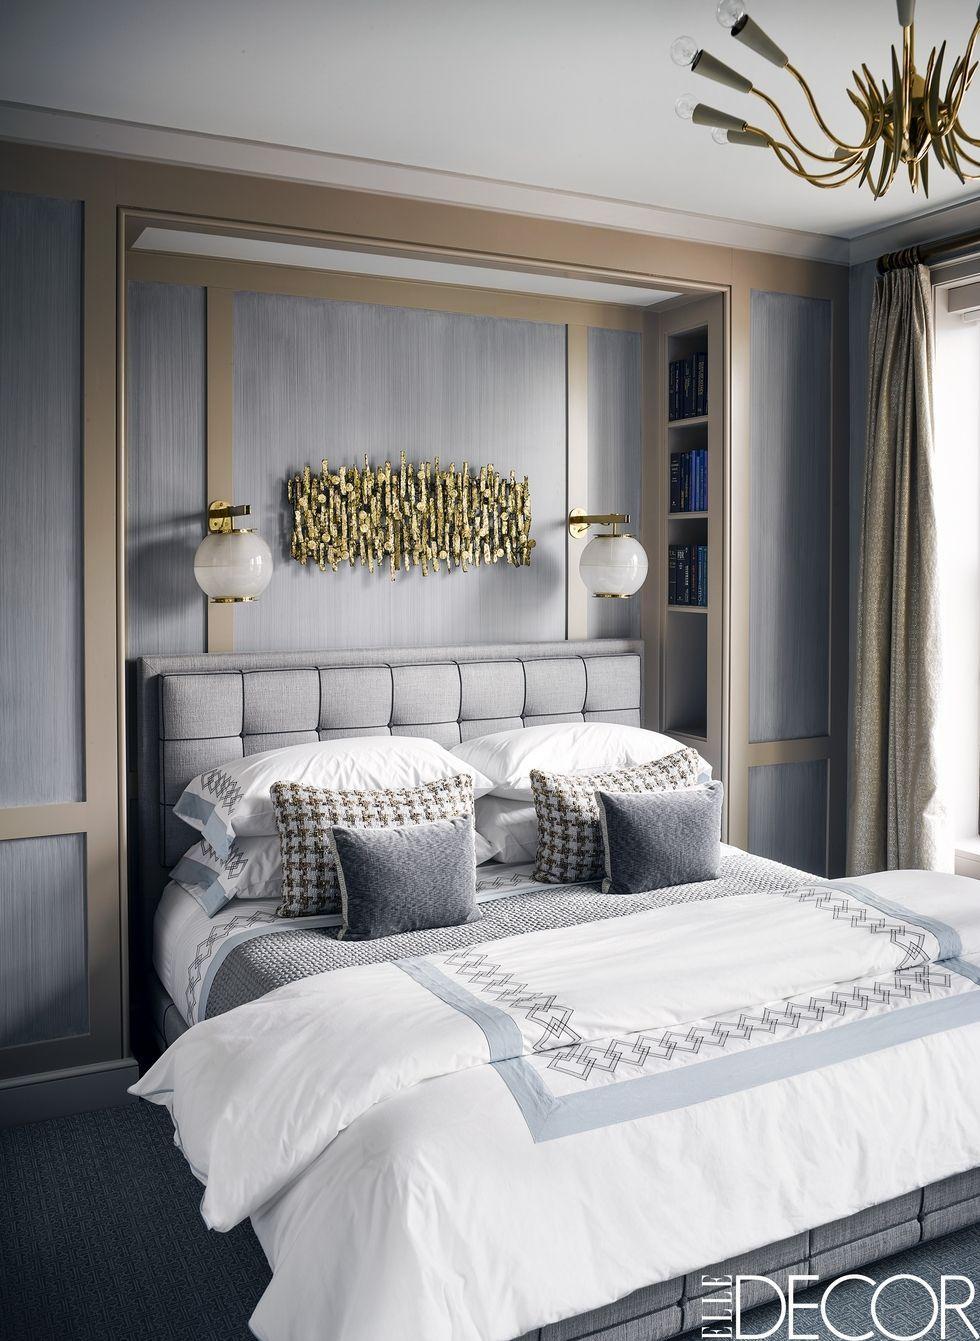 Modern Art Deco Room Design